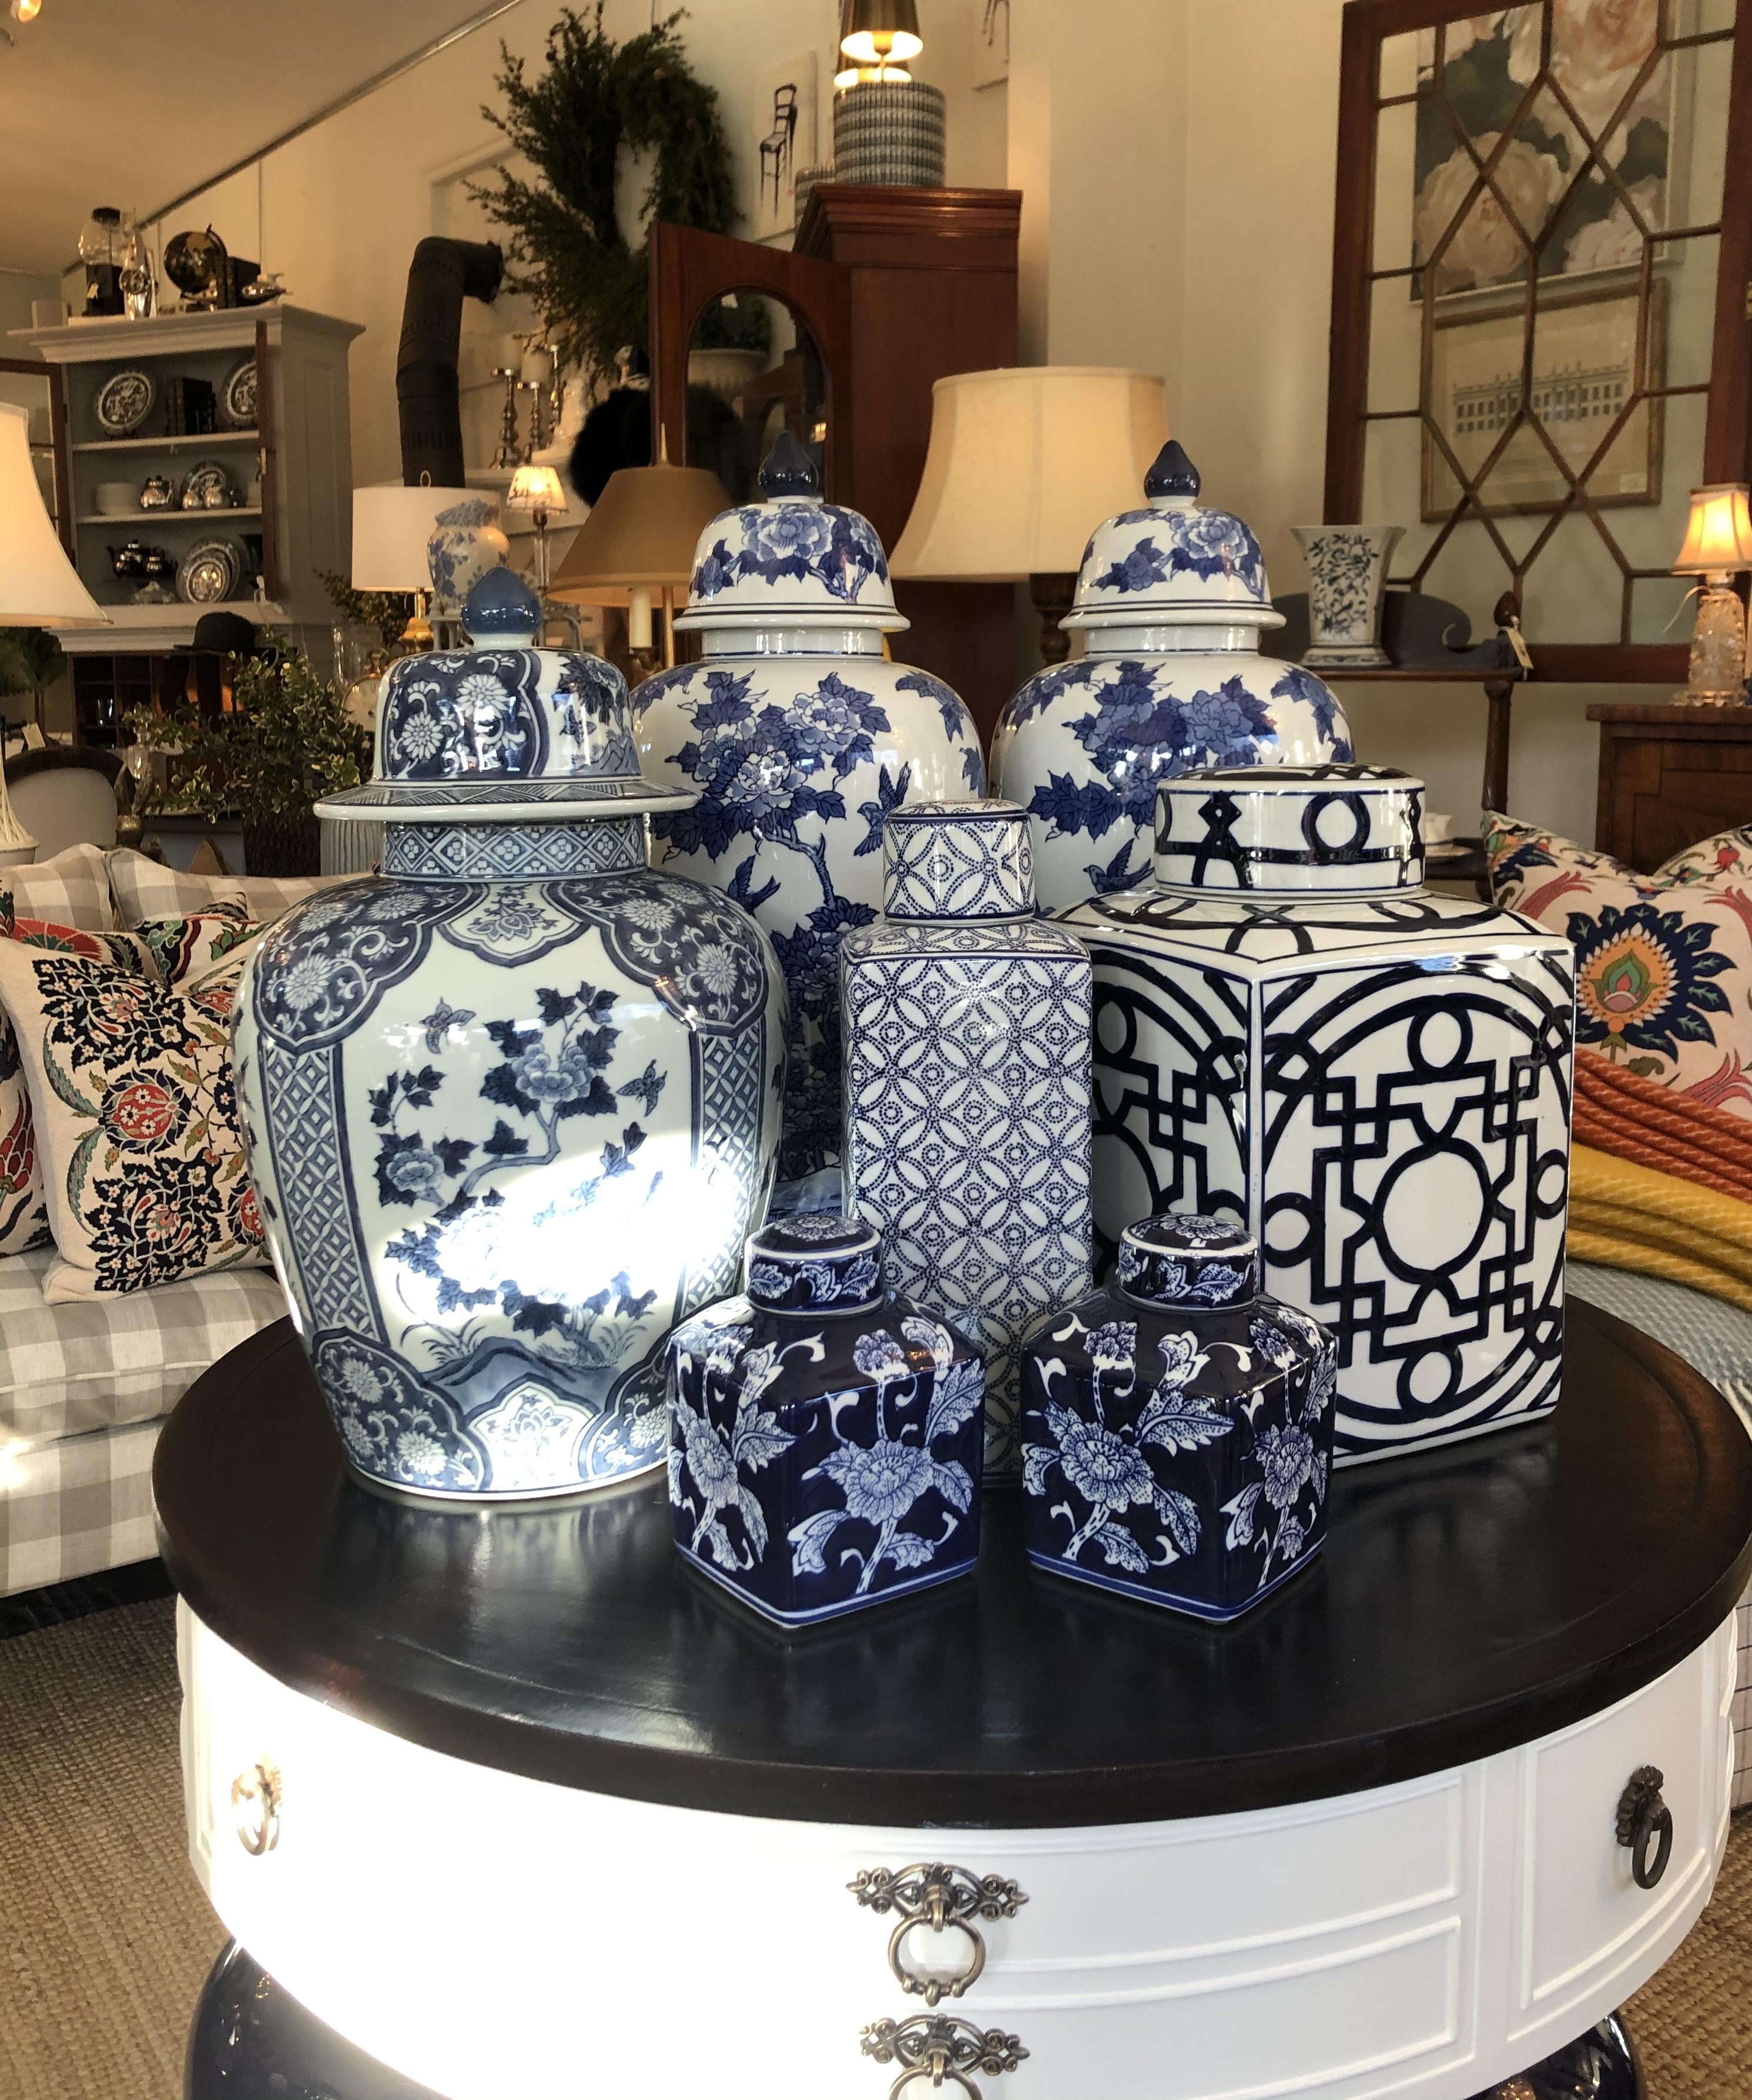 Blue and White Ginger Jar Assortment